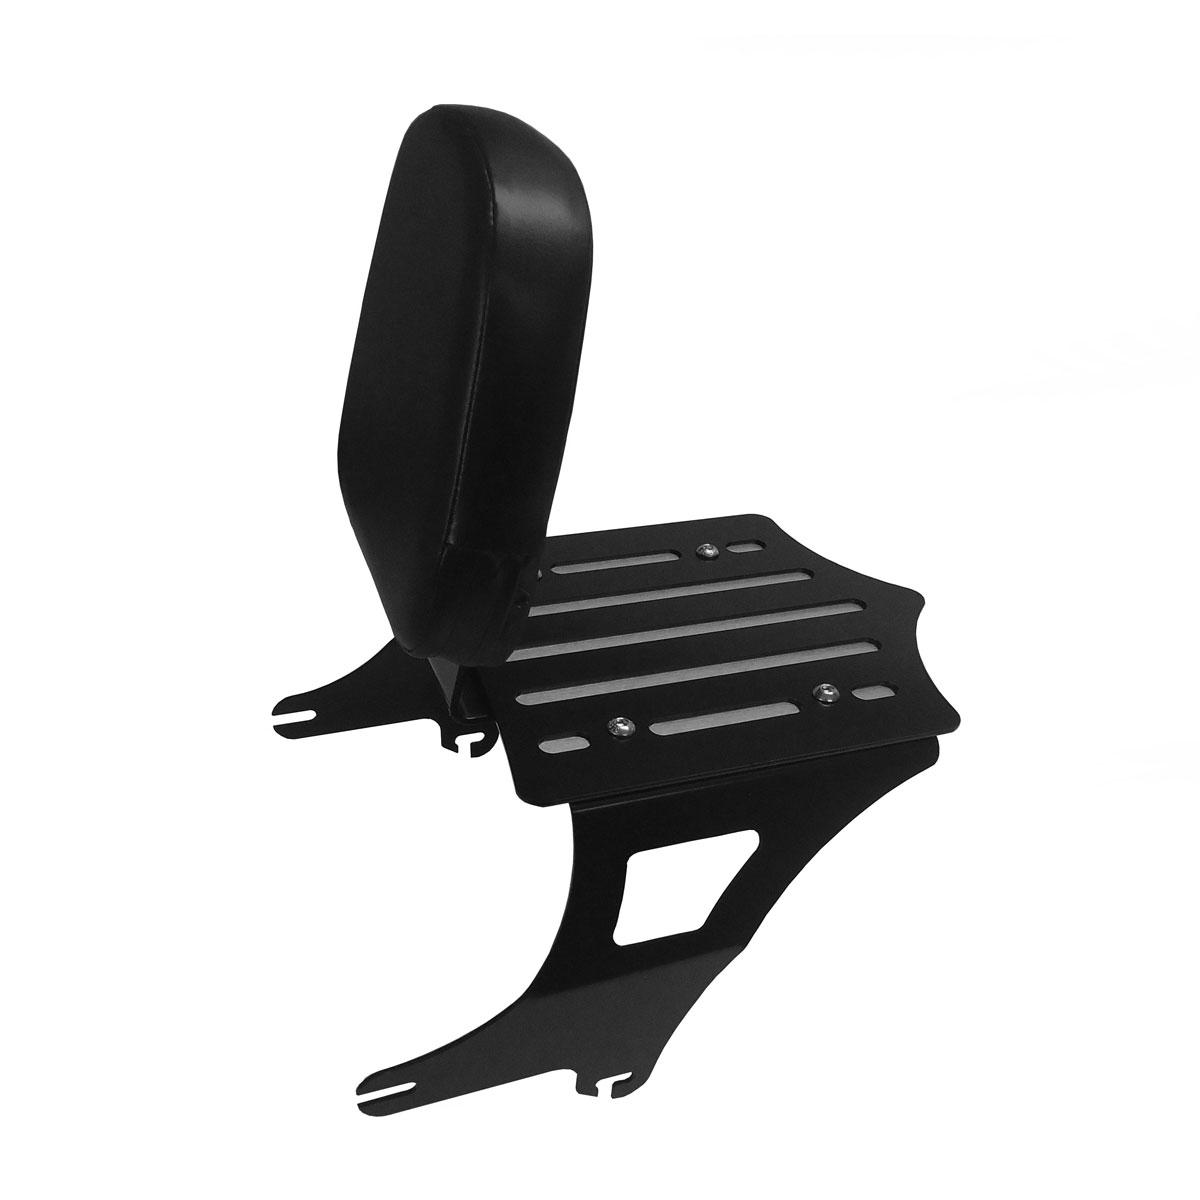 BDD Custom Black Slot Sissy Bar w/Luggage Rack & Backrest for 2-Up Seats